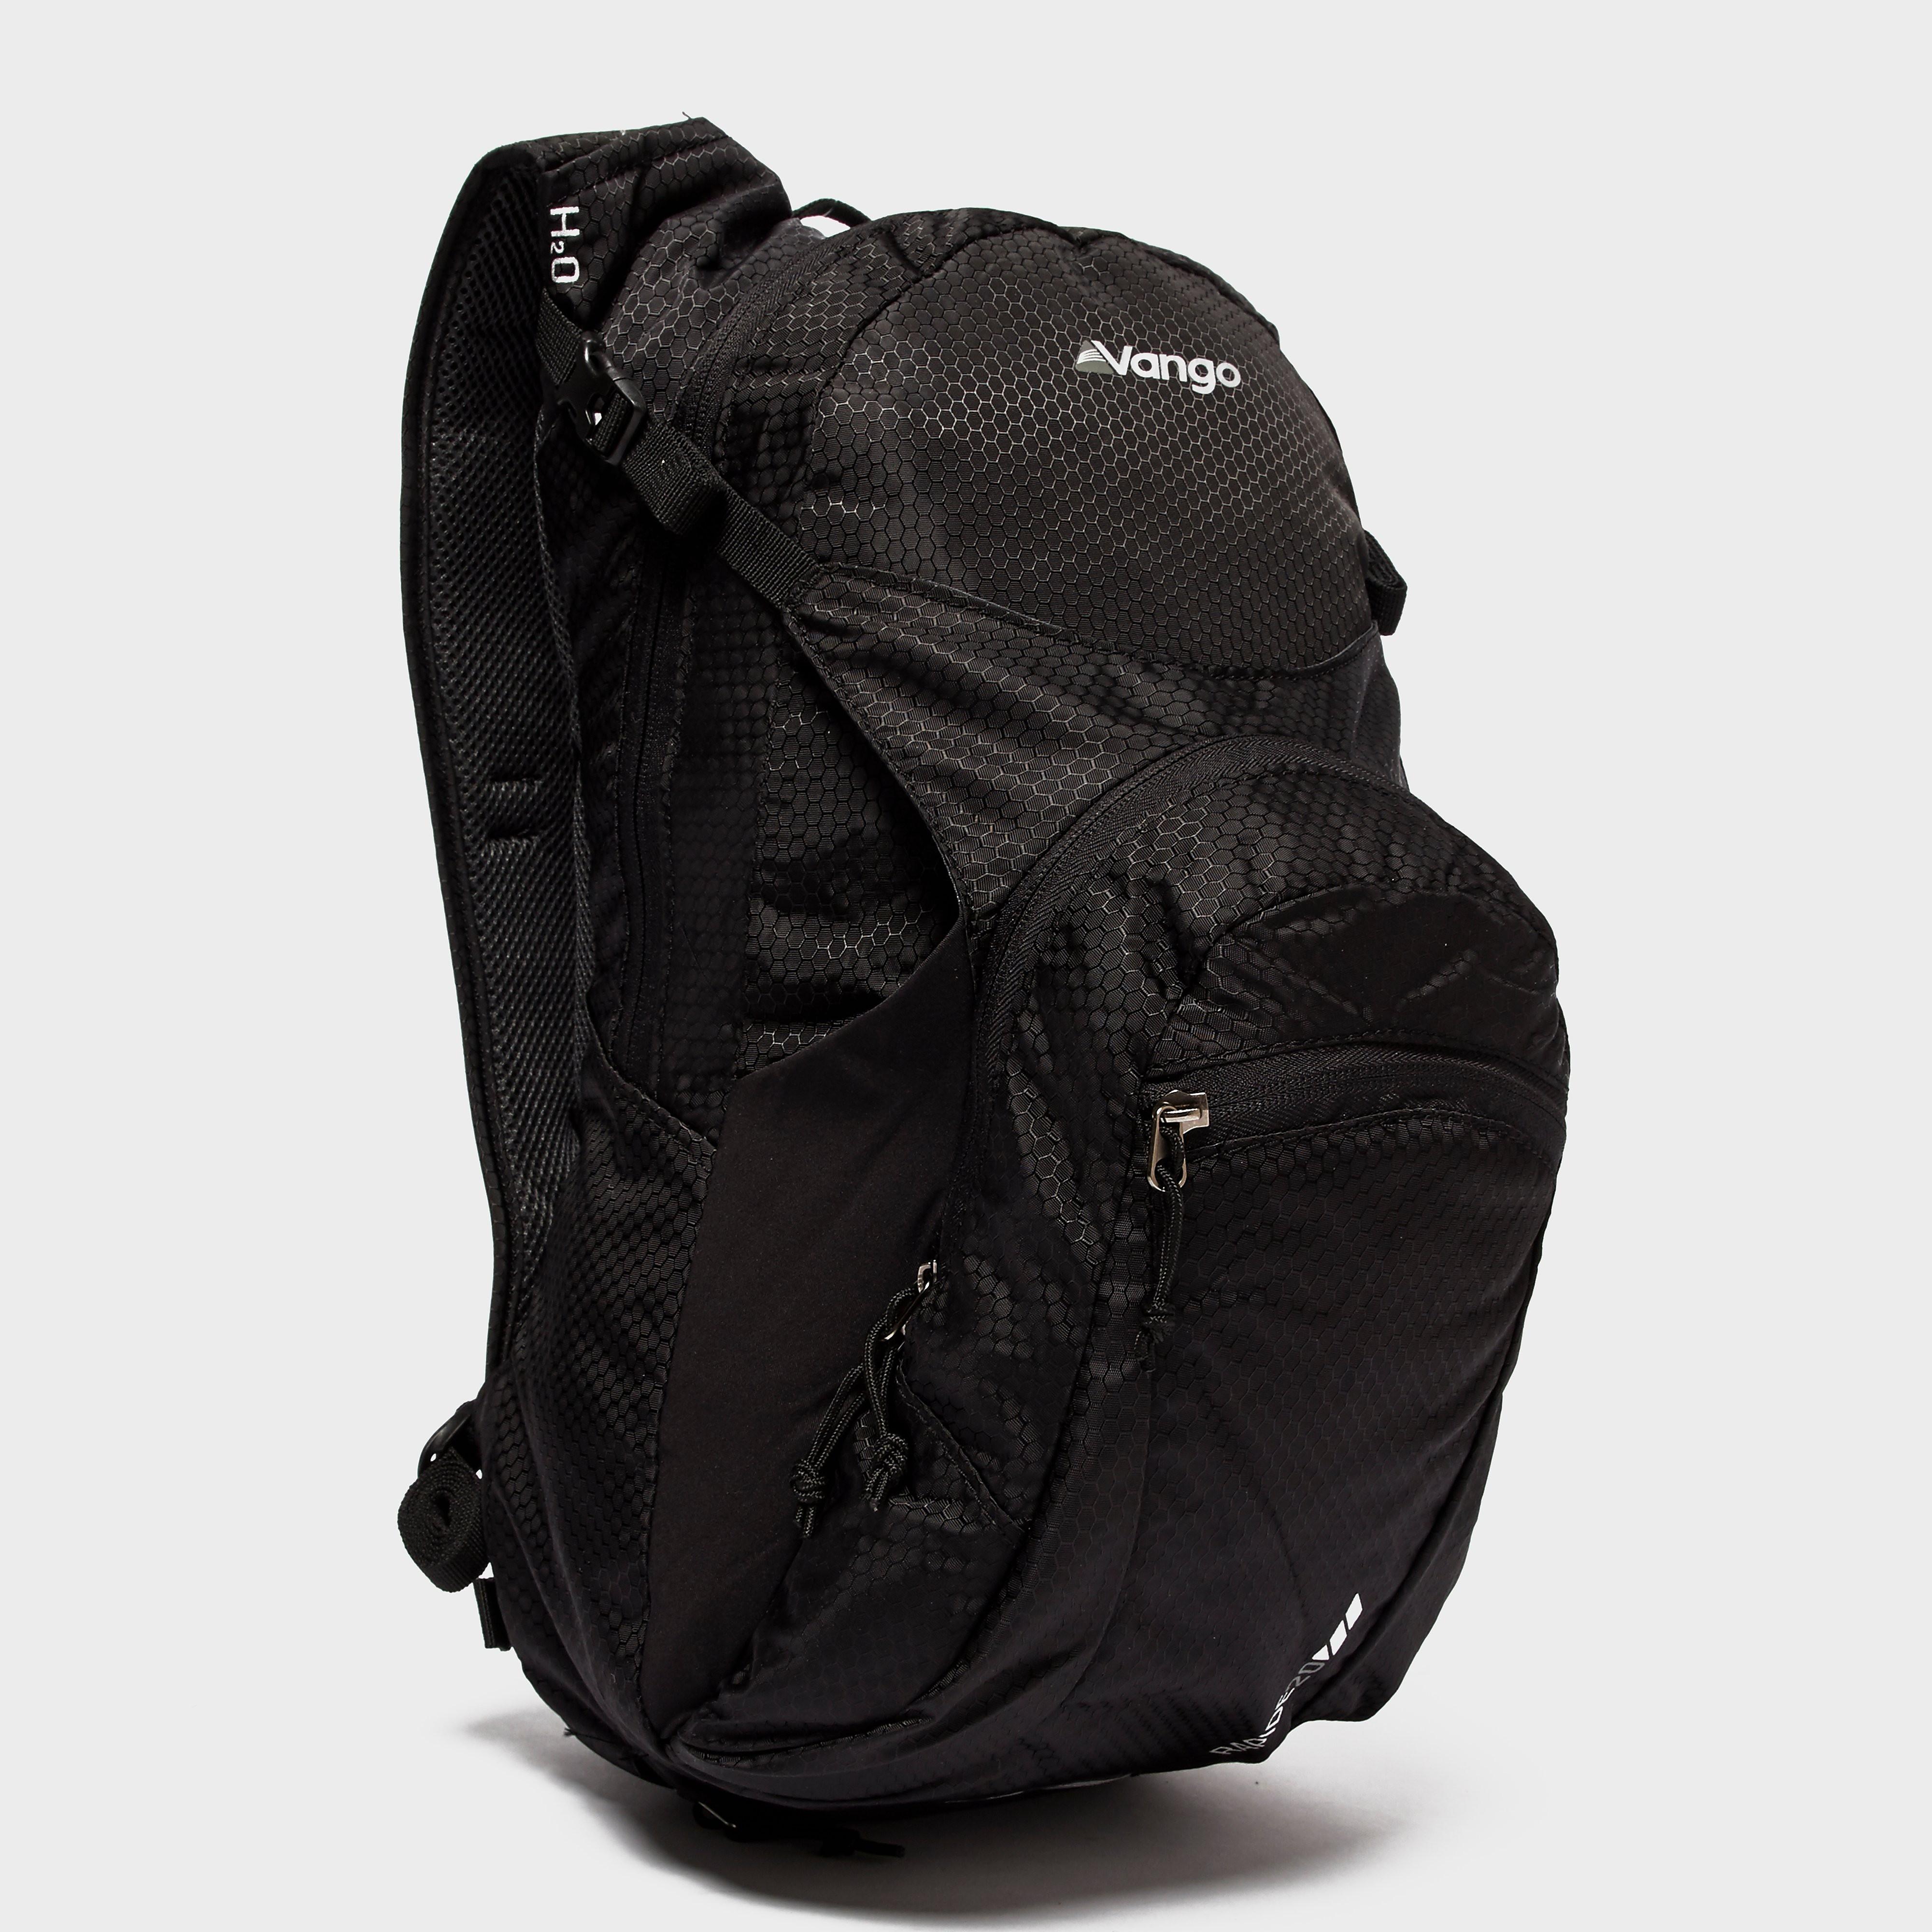 Vango Rapide 20L Daysack